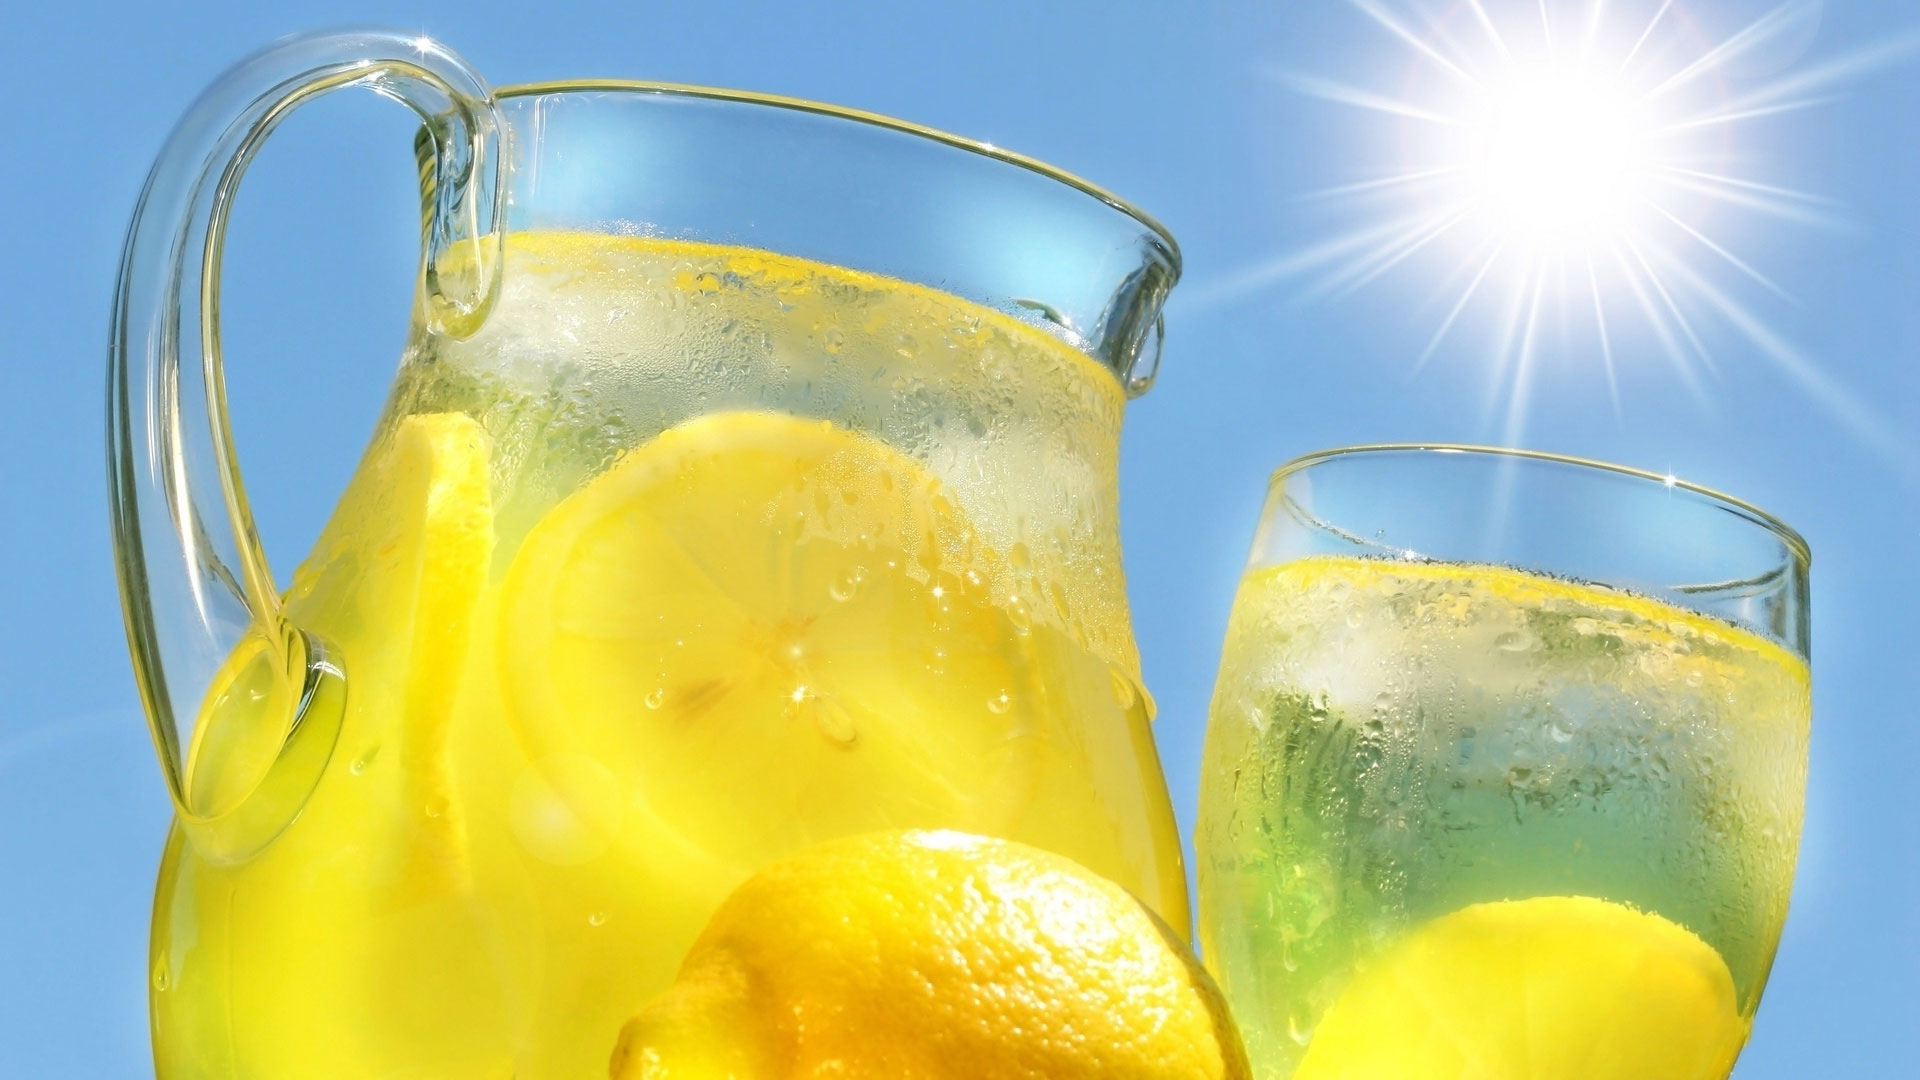 Summer Desktop Wallpaper Hd 8 Lovely Hd Lemonade Drink Wallpapers